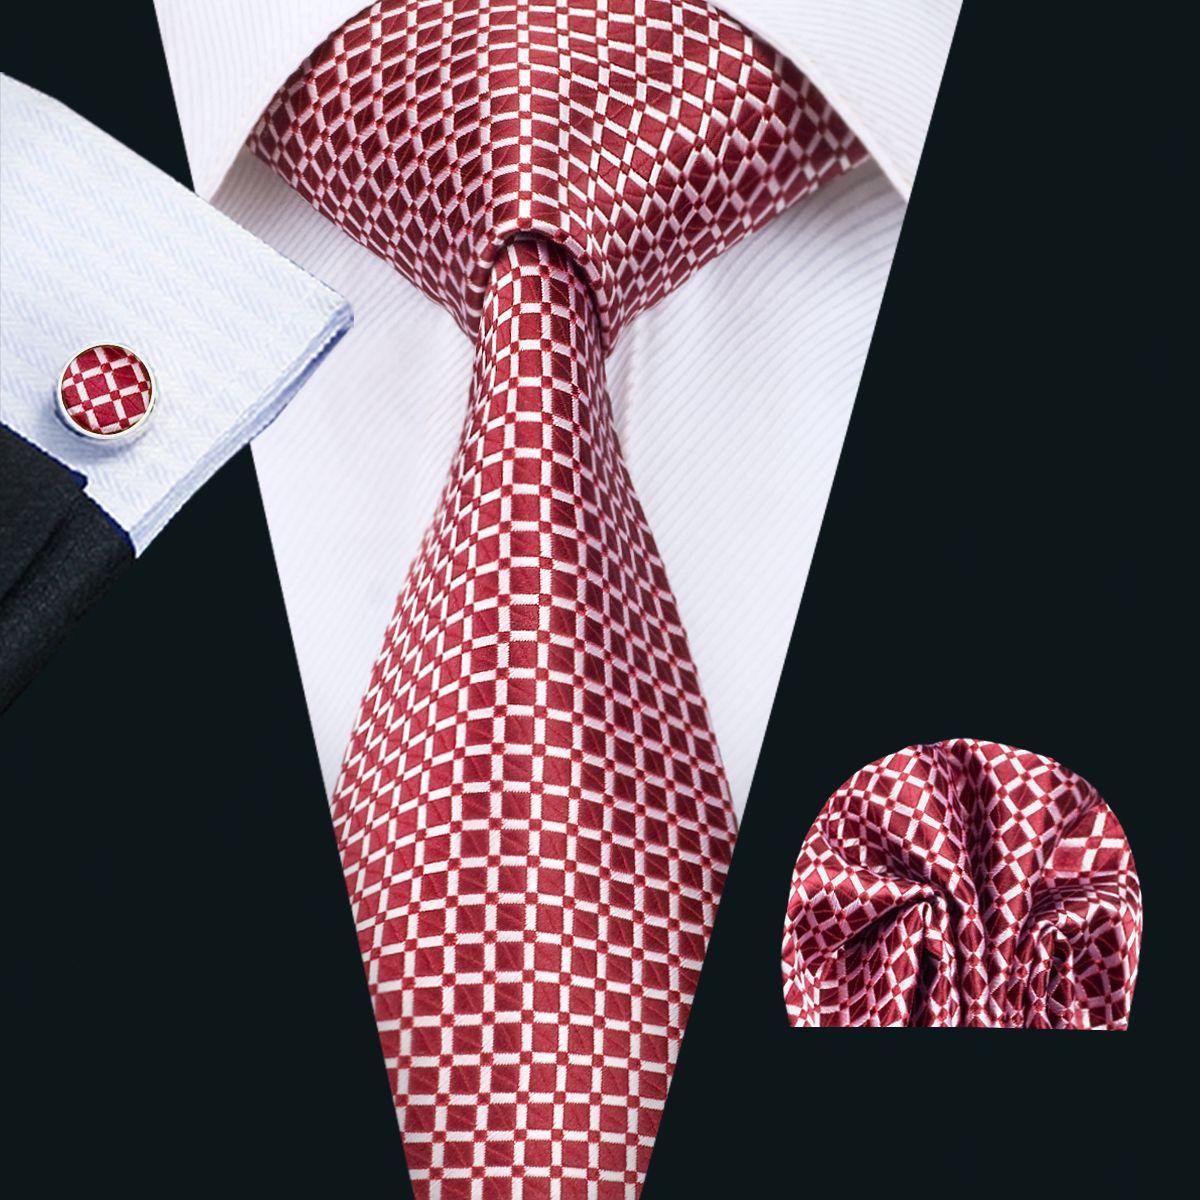 7862ecef3bd5 2019 Classic Silk Mens Ties Red Tie Sets Checks Mens Neckties Tie Hanky  Cufflinks Jacquard Woven Meeting Business Casual Party Necktie N 1407 From  ...